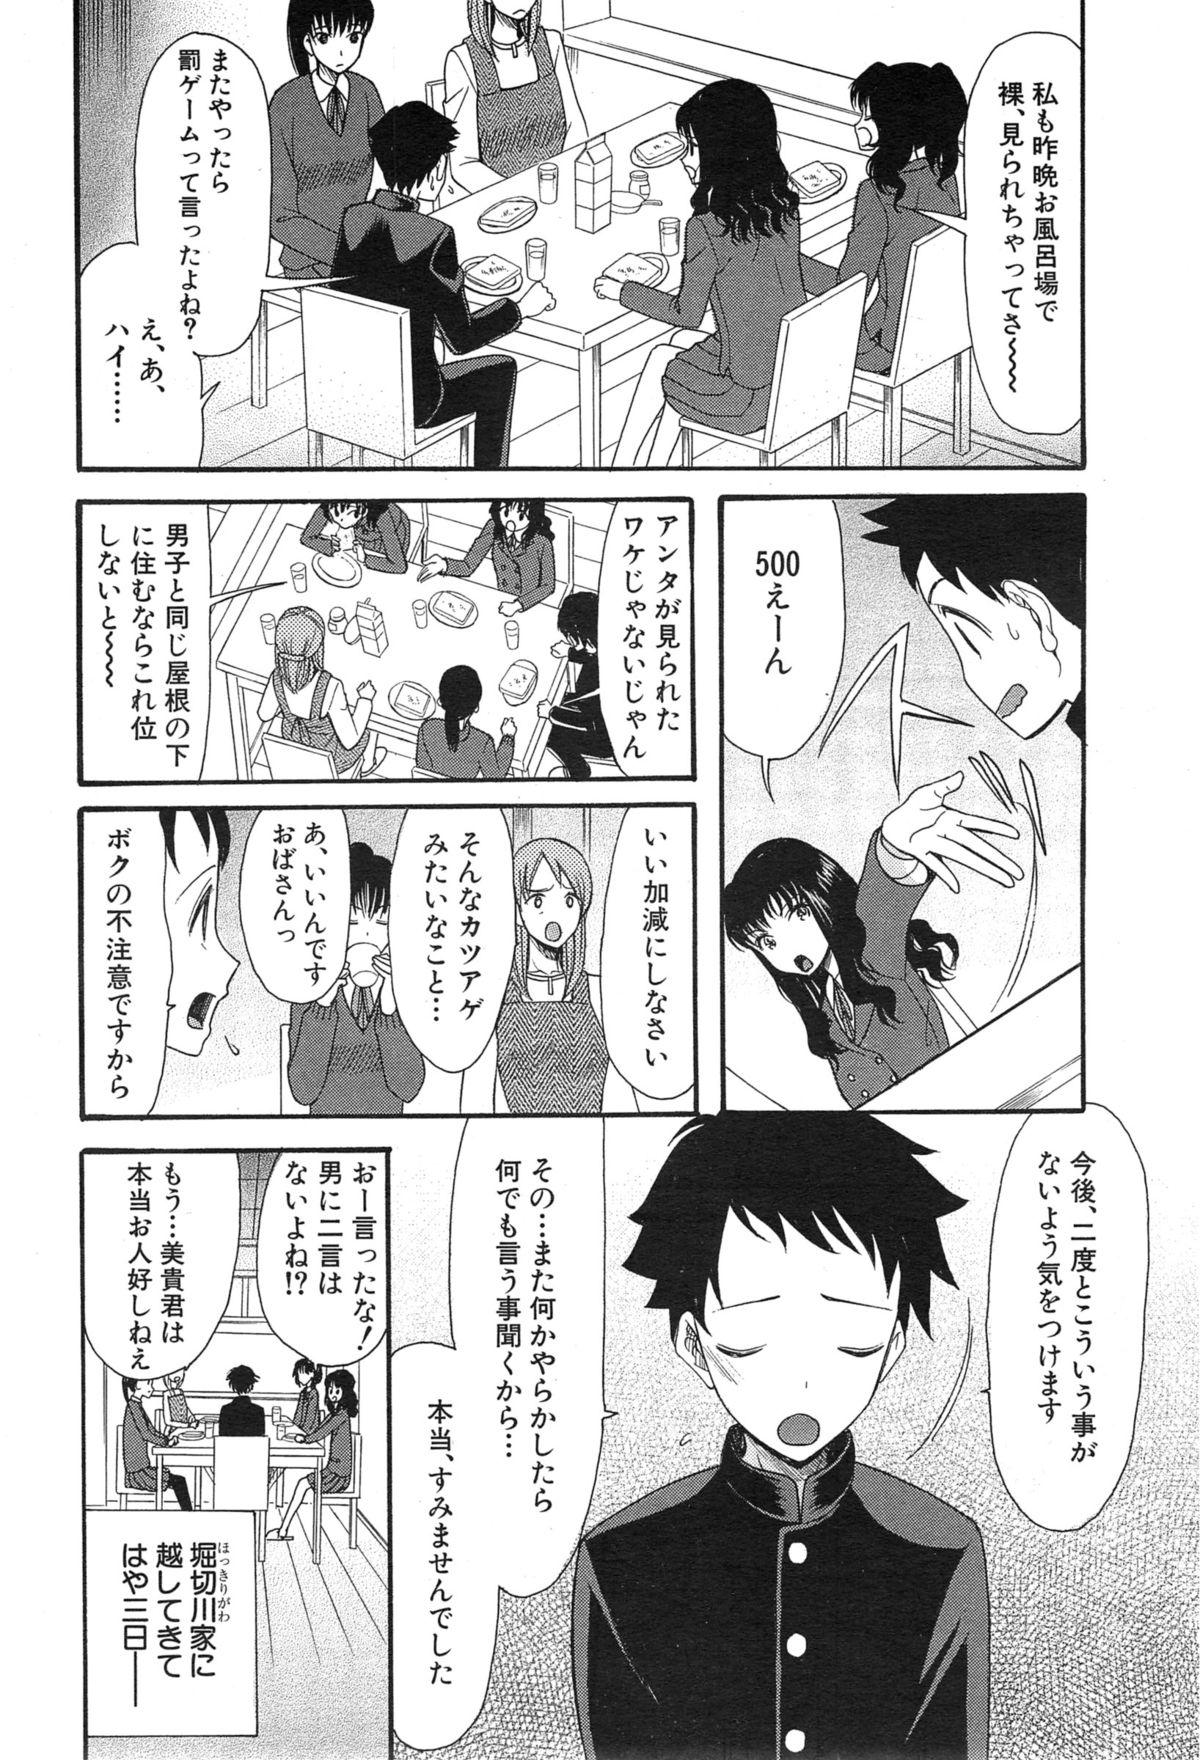 Kawaiku Natte Omocha ni Natte 1